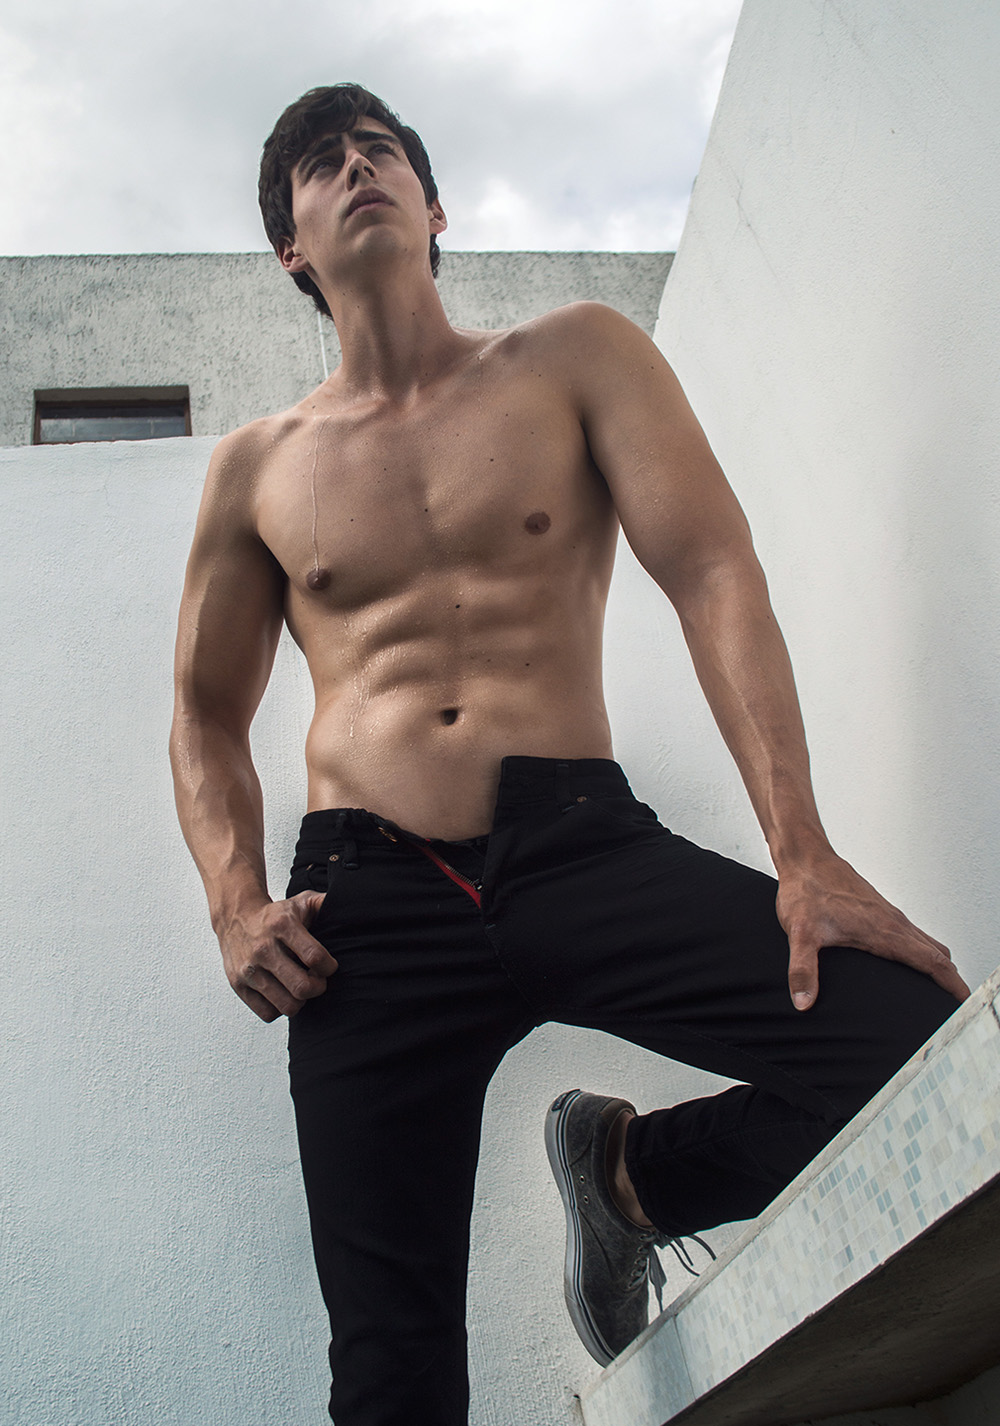 Ivan Malacon photographed by Osvaldo Padilla